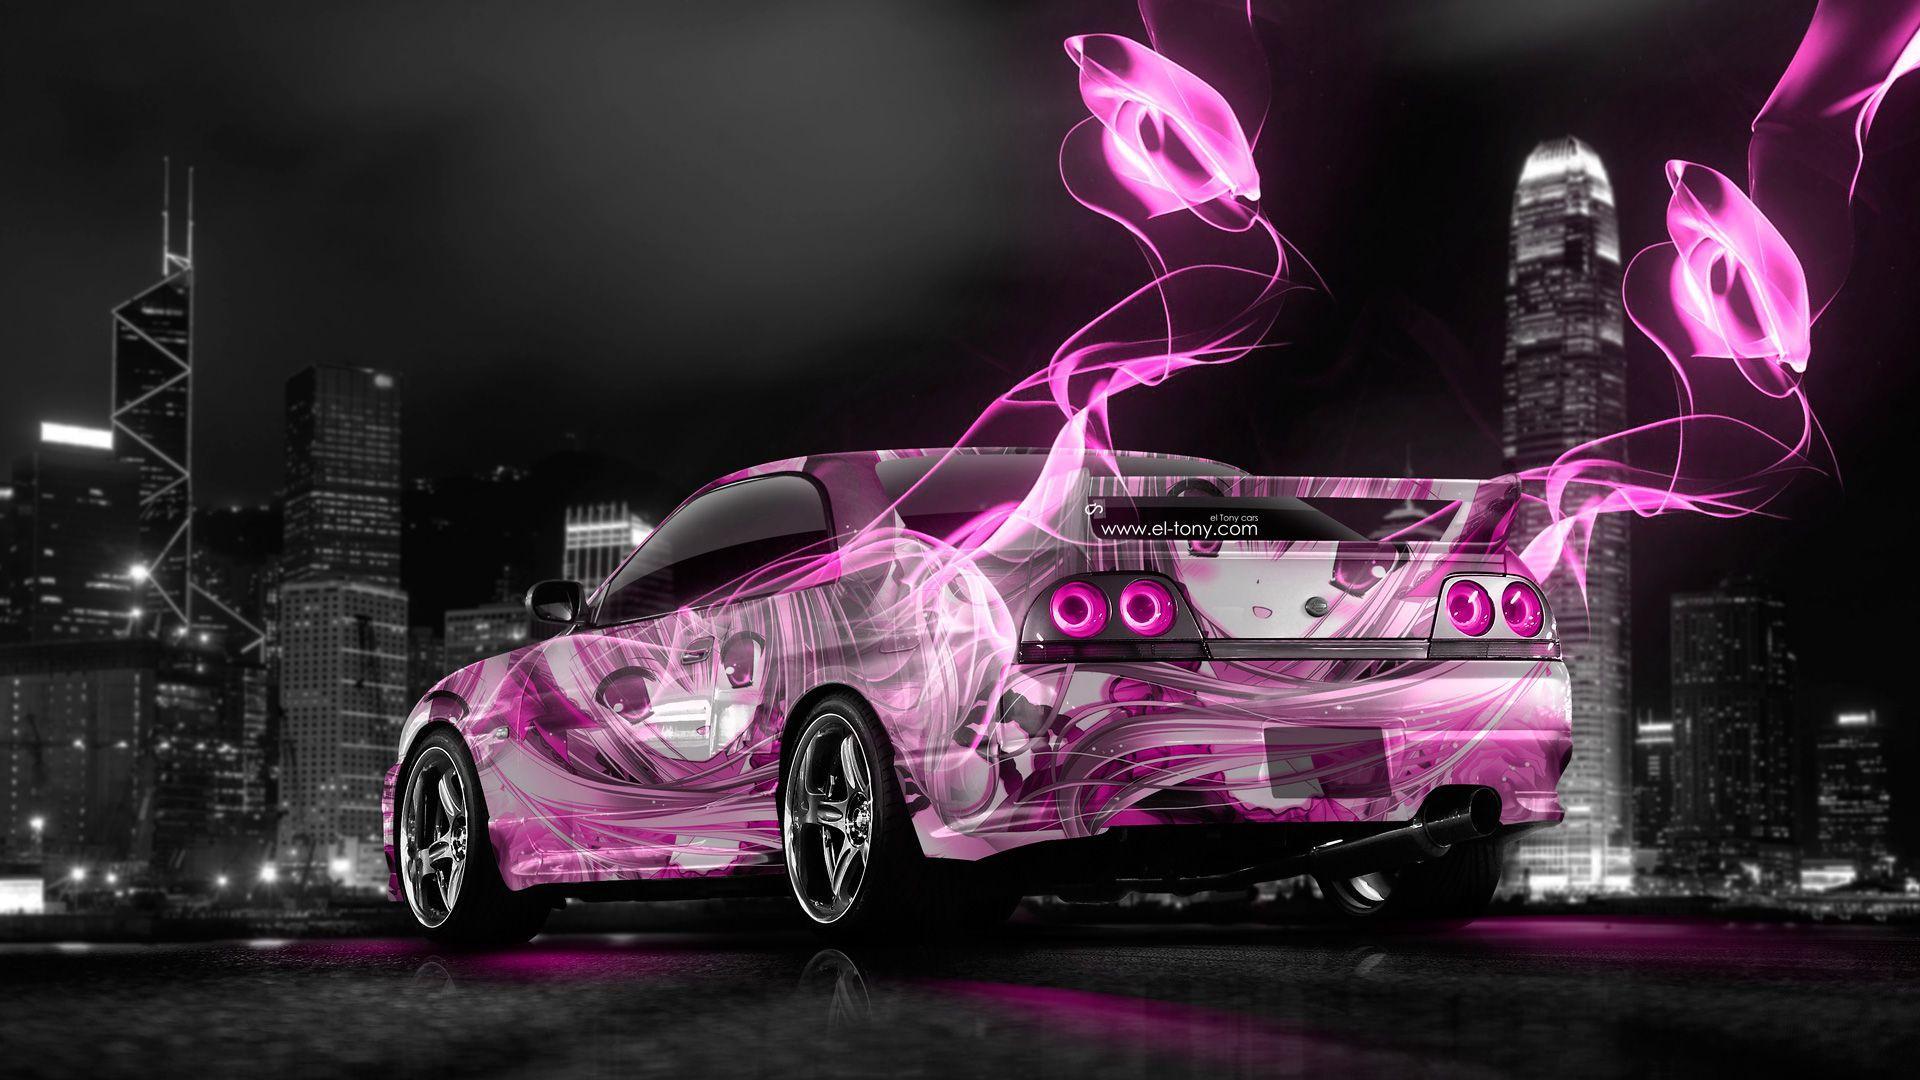 Nissan Skyline GTR R33 JDM Anime Aerography City Car 2014 | El Tony